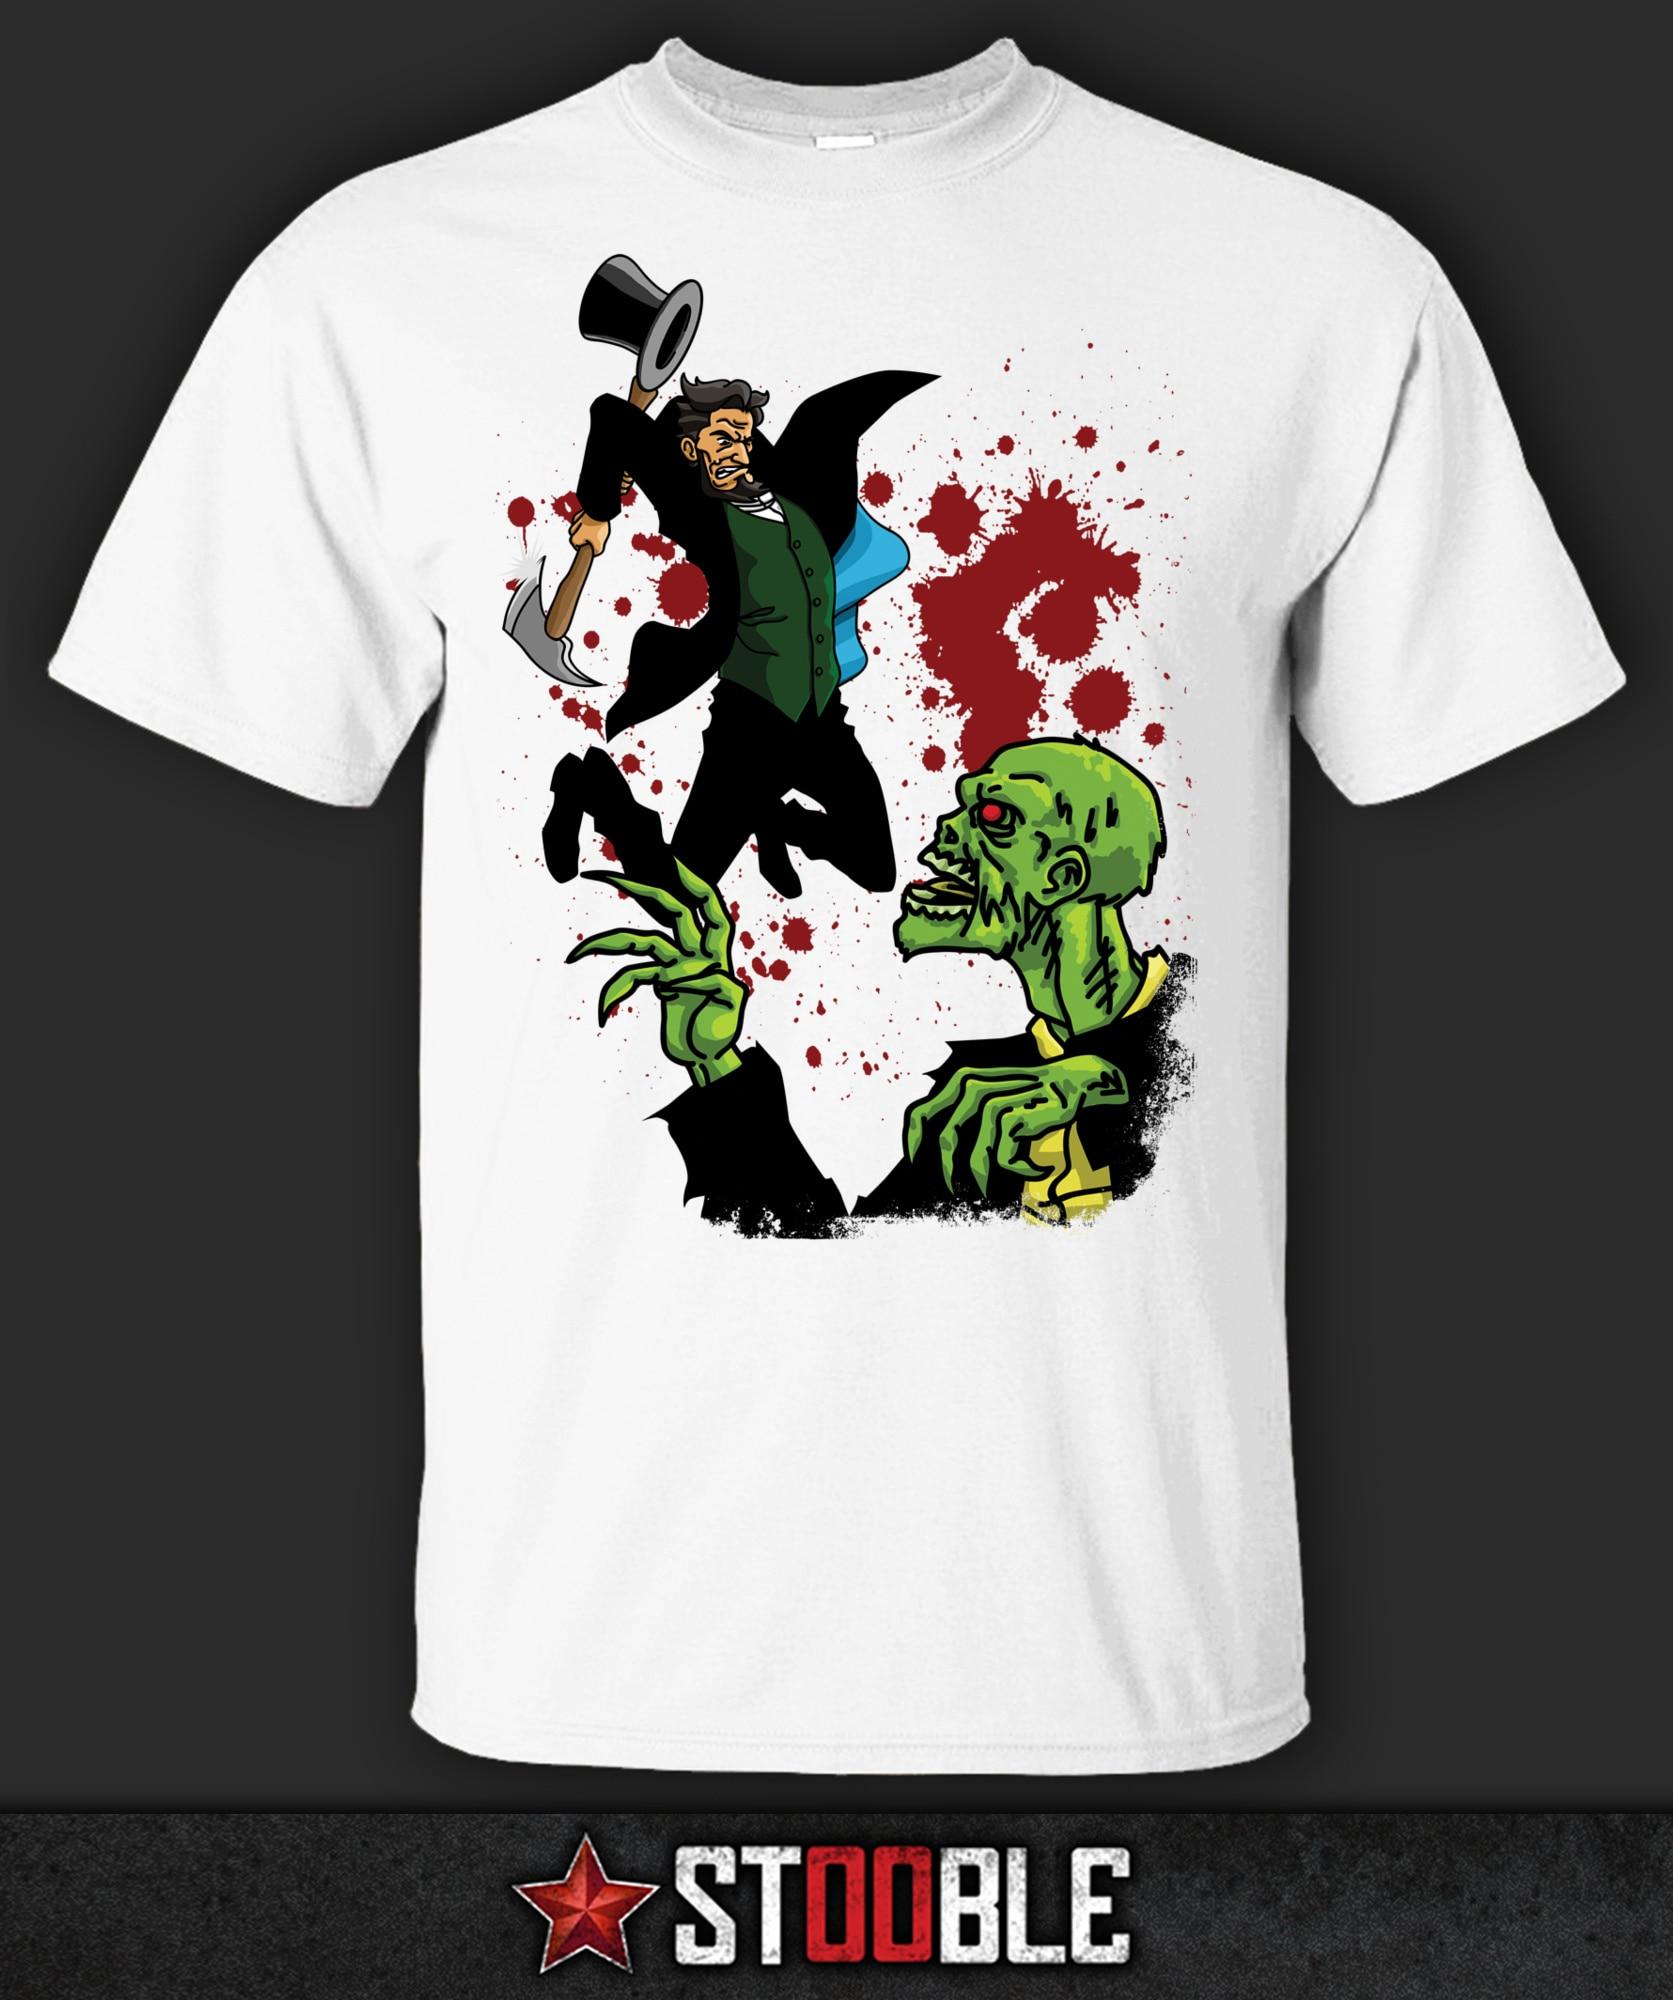 Abraham Lincoln vs camiseta Zombie-Direct de StockistNew Arrival camisetas casuales para Hombre Camisetas con niño Tops descuentos